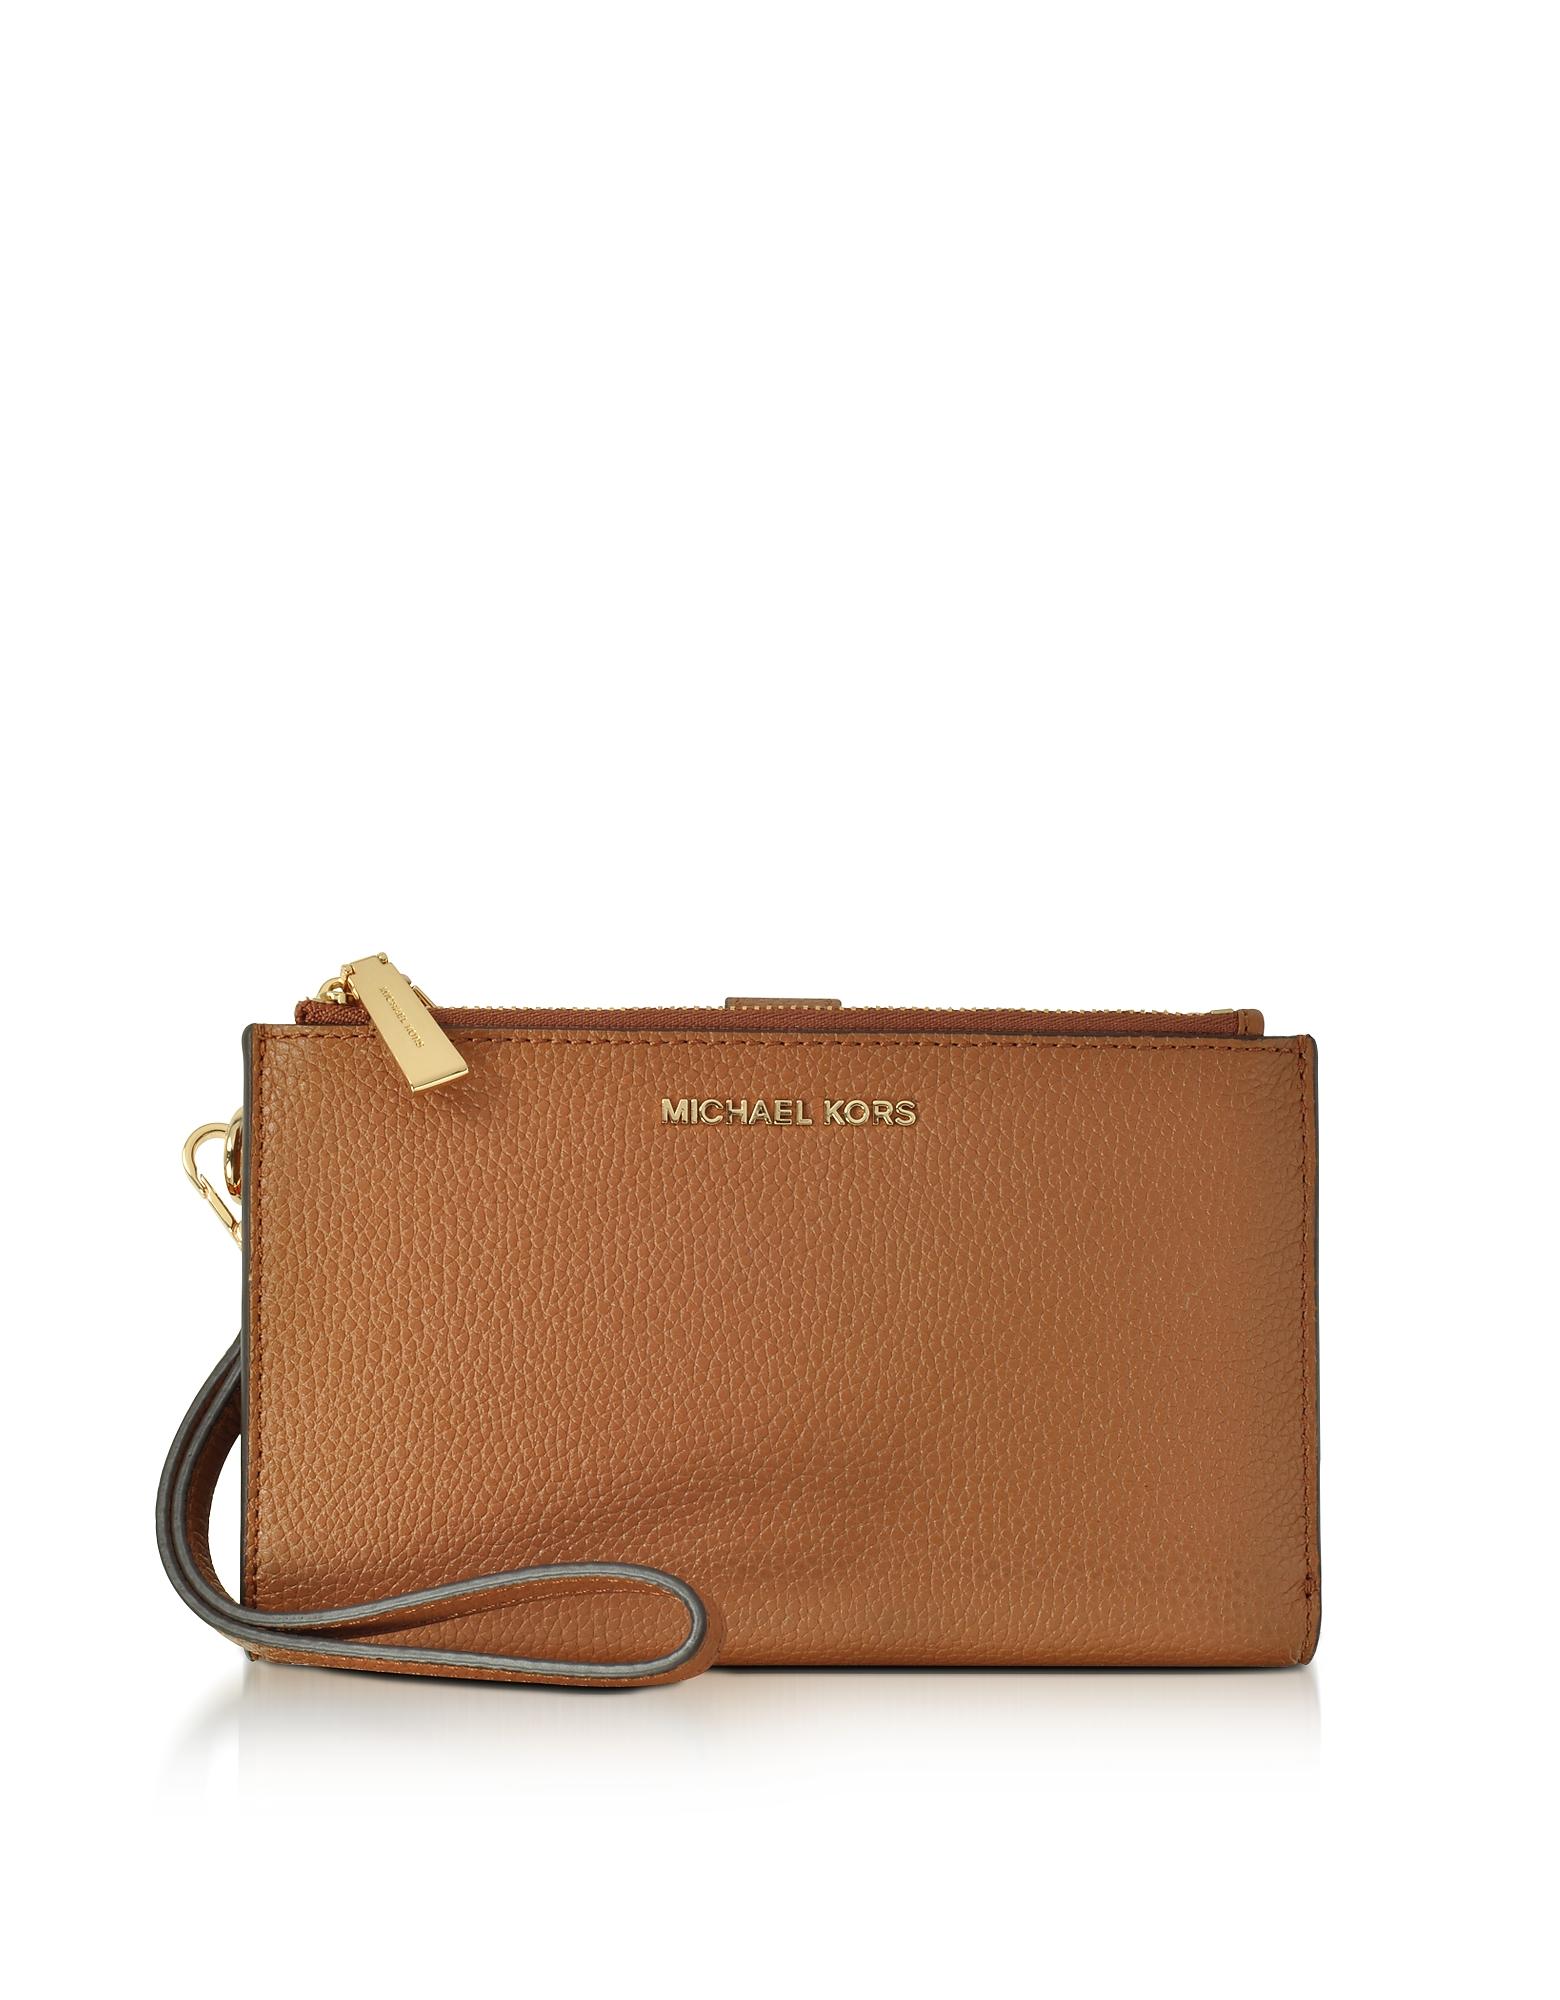 Michael Kors Handbags, Adele Acorn Pebble Leather Smartphone Wristlet